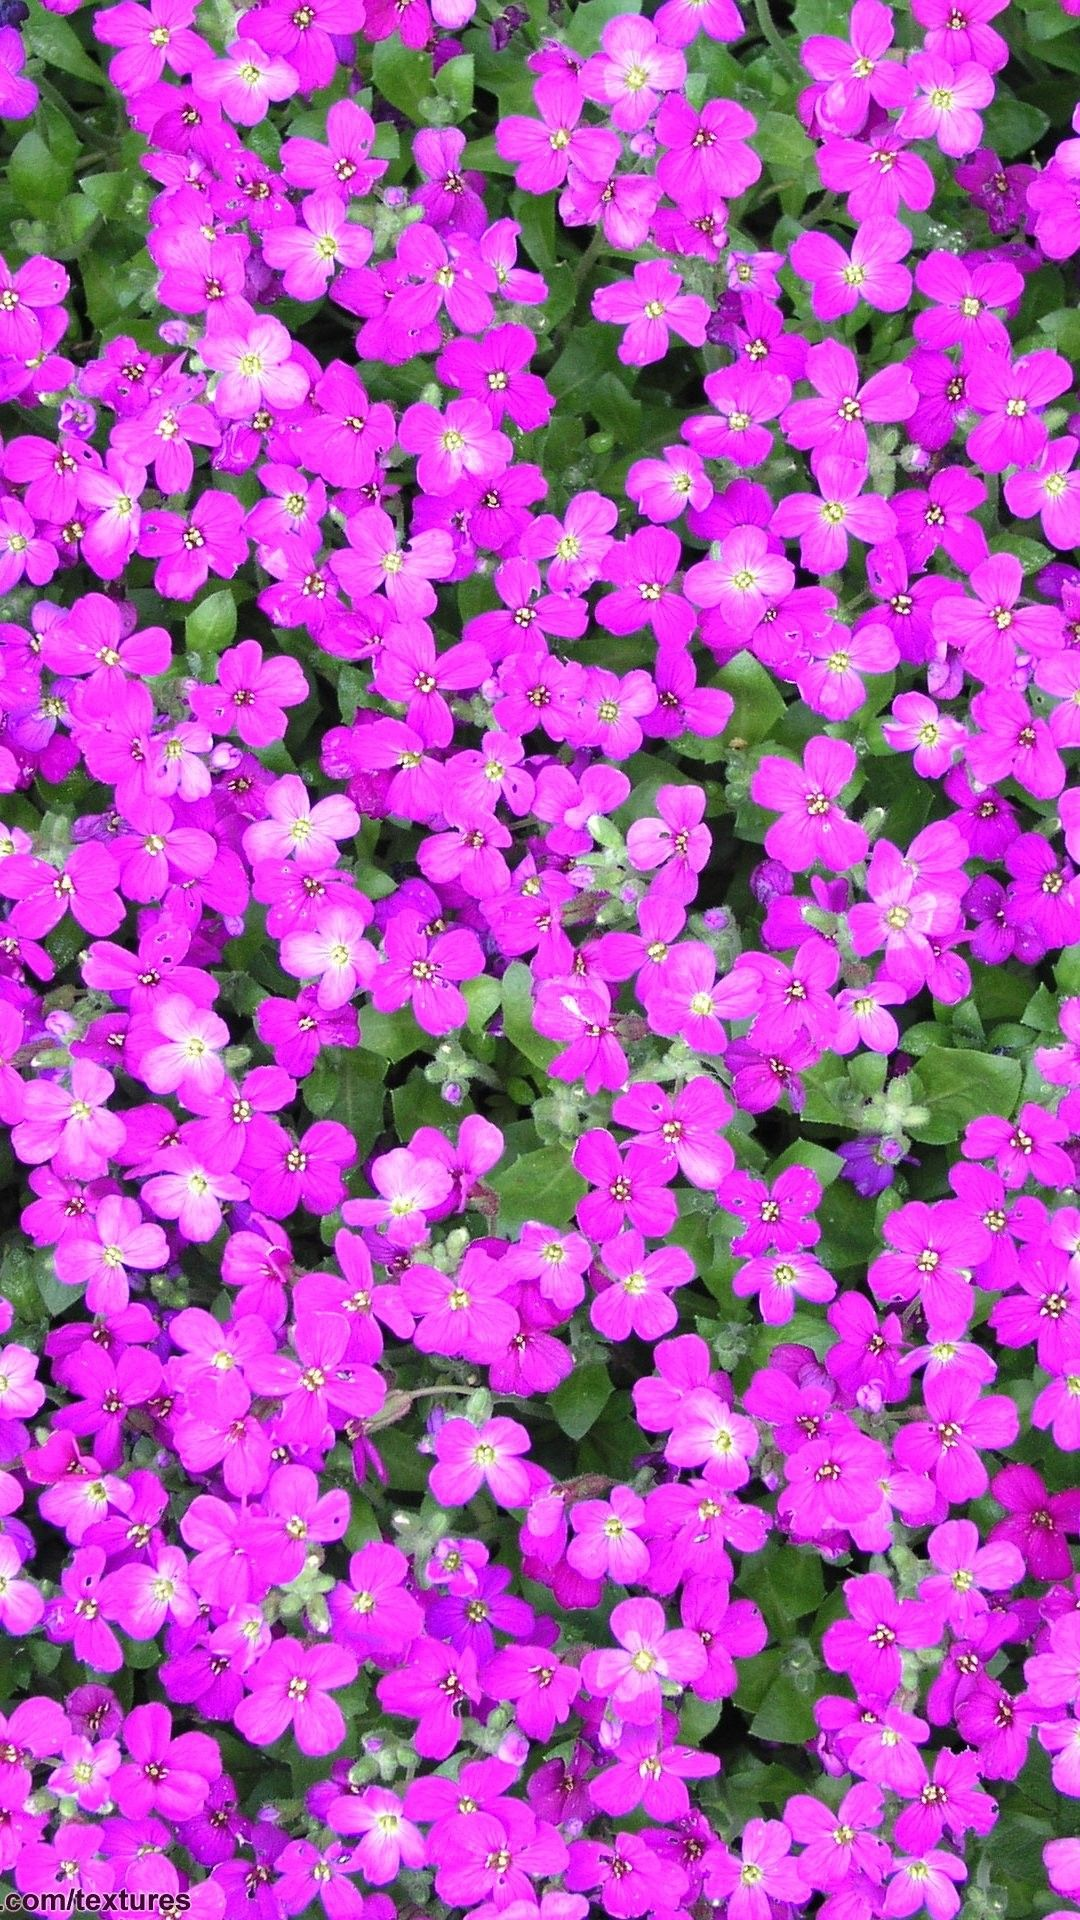 Iphone 6 wallpaper tumblr flower - Purple Flowers Iphone 6 Plus Wallpaper 14068 Flowers Iphone 6 Plus Wallpapers